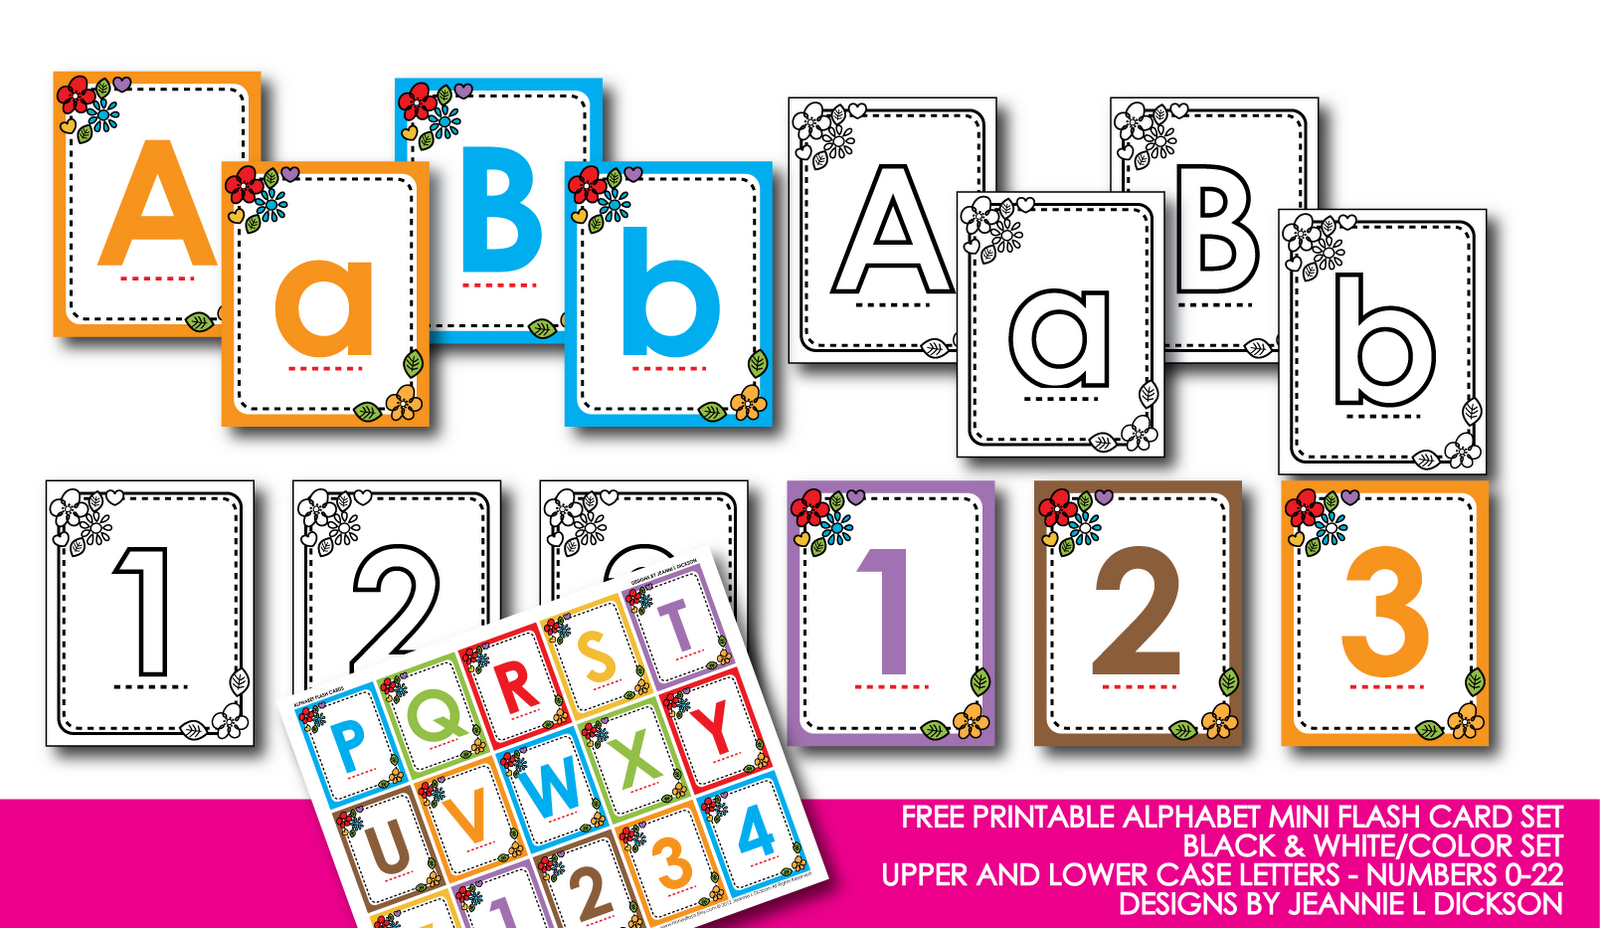 Kindergarten Alphabet Cards | Free Printable Alphabet Mini Flash - Free Printable Flash Cards